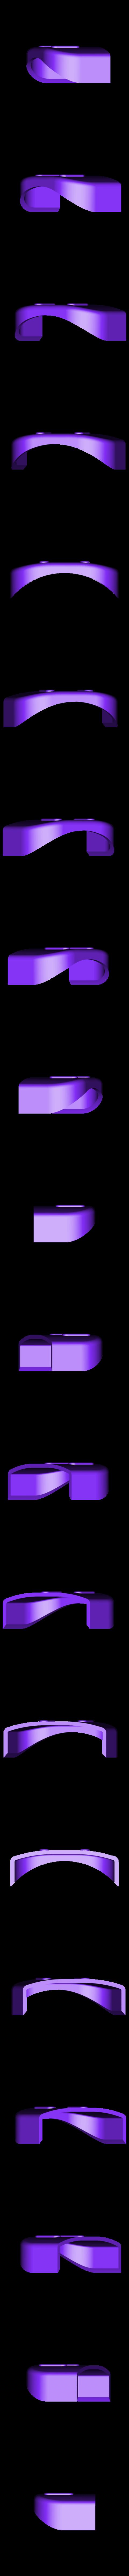 Sandbox_Back-_top_SCALED-b.STL Download free STL file 4-8-8-4 Big Boy Locomotive • 3D printer object, RaymondDeLuca